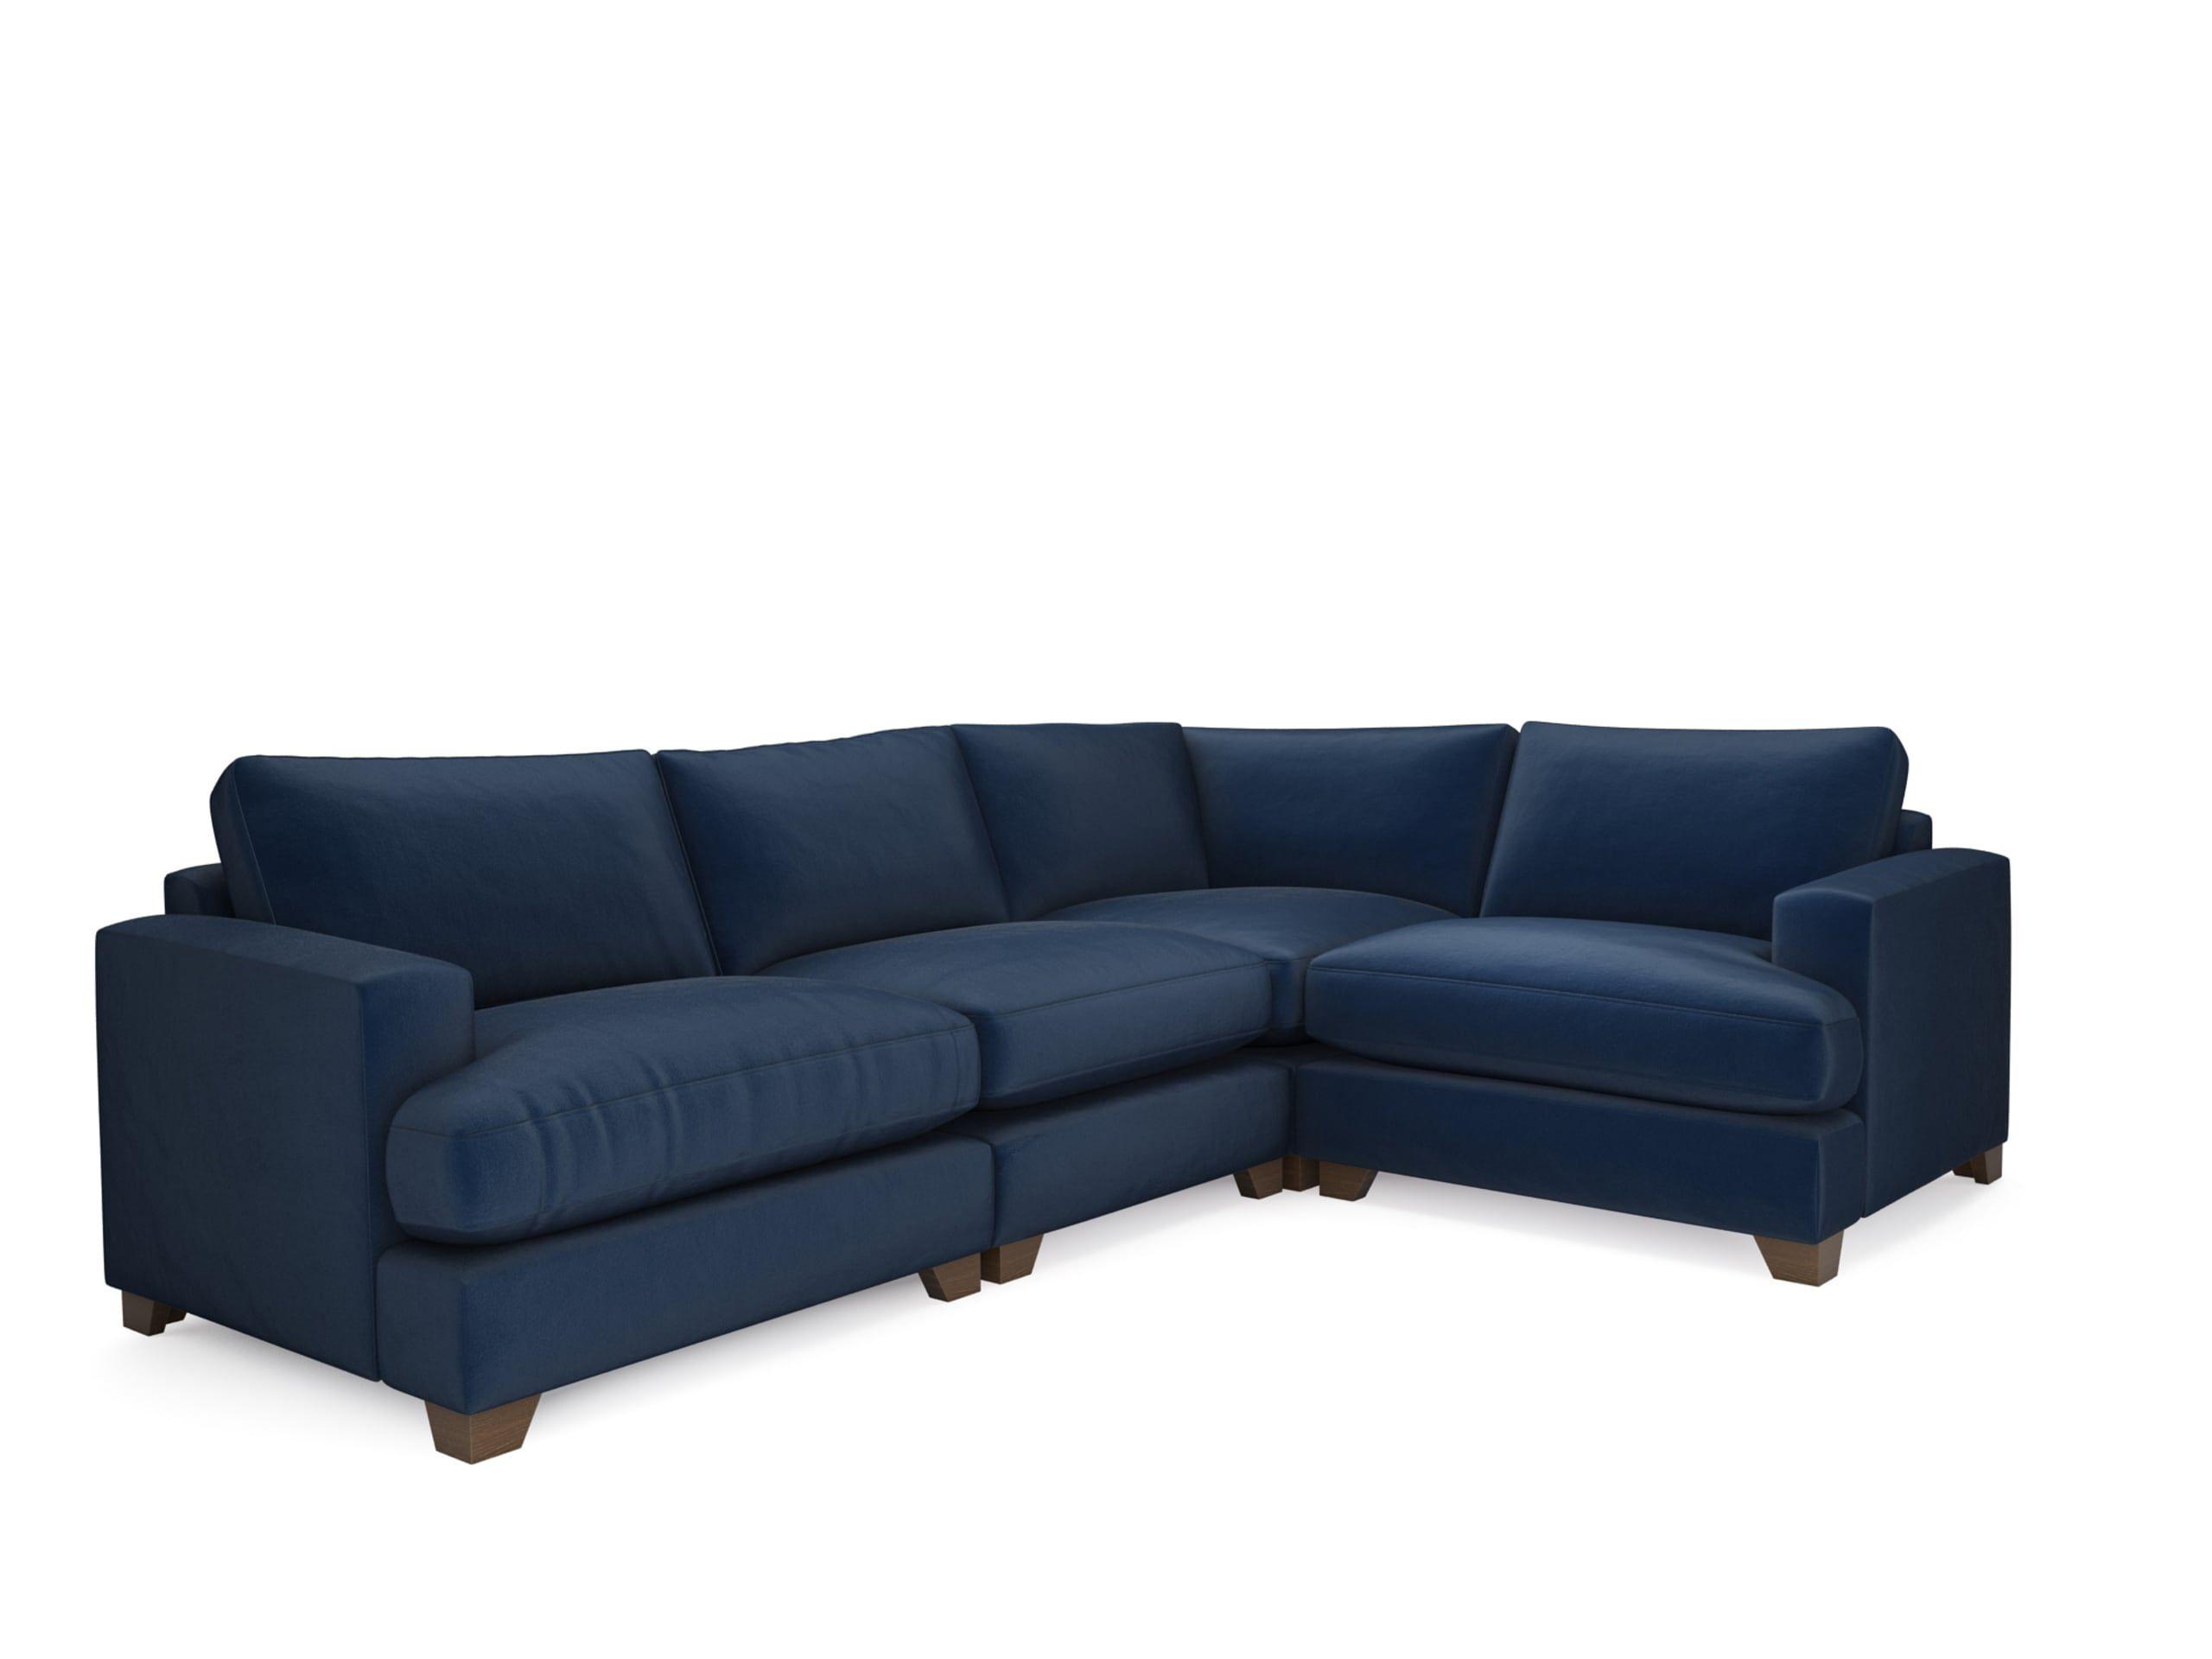 The Lounge Co Lola Corner End In Velvet Touch Midnight Indigo Theloungeco Trend Indigo Navy Sofa Living Room Blue Corner Sofas Corner Sofa Living Room